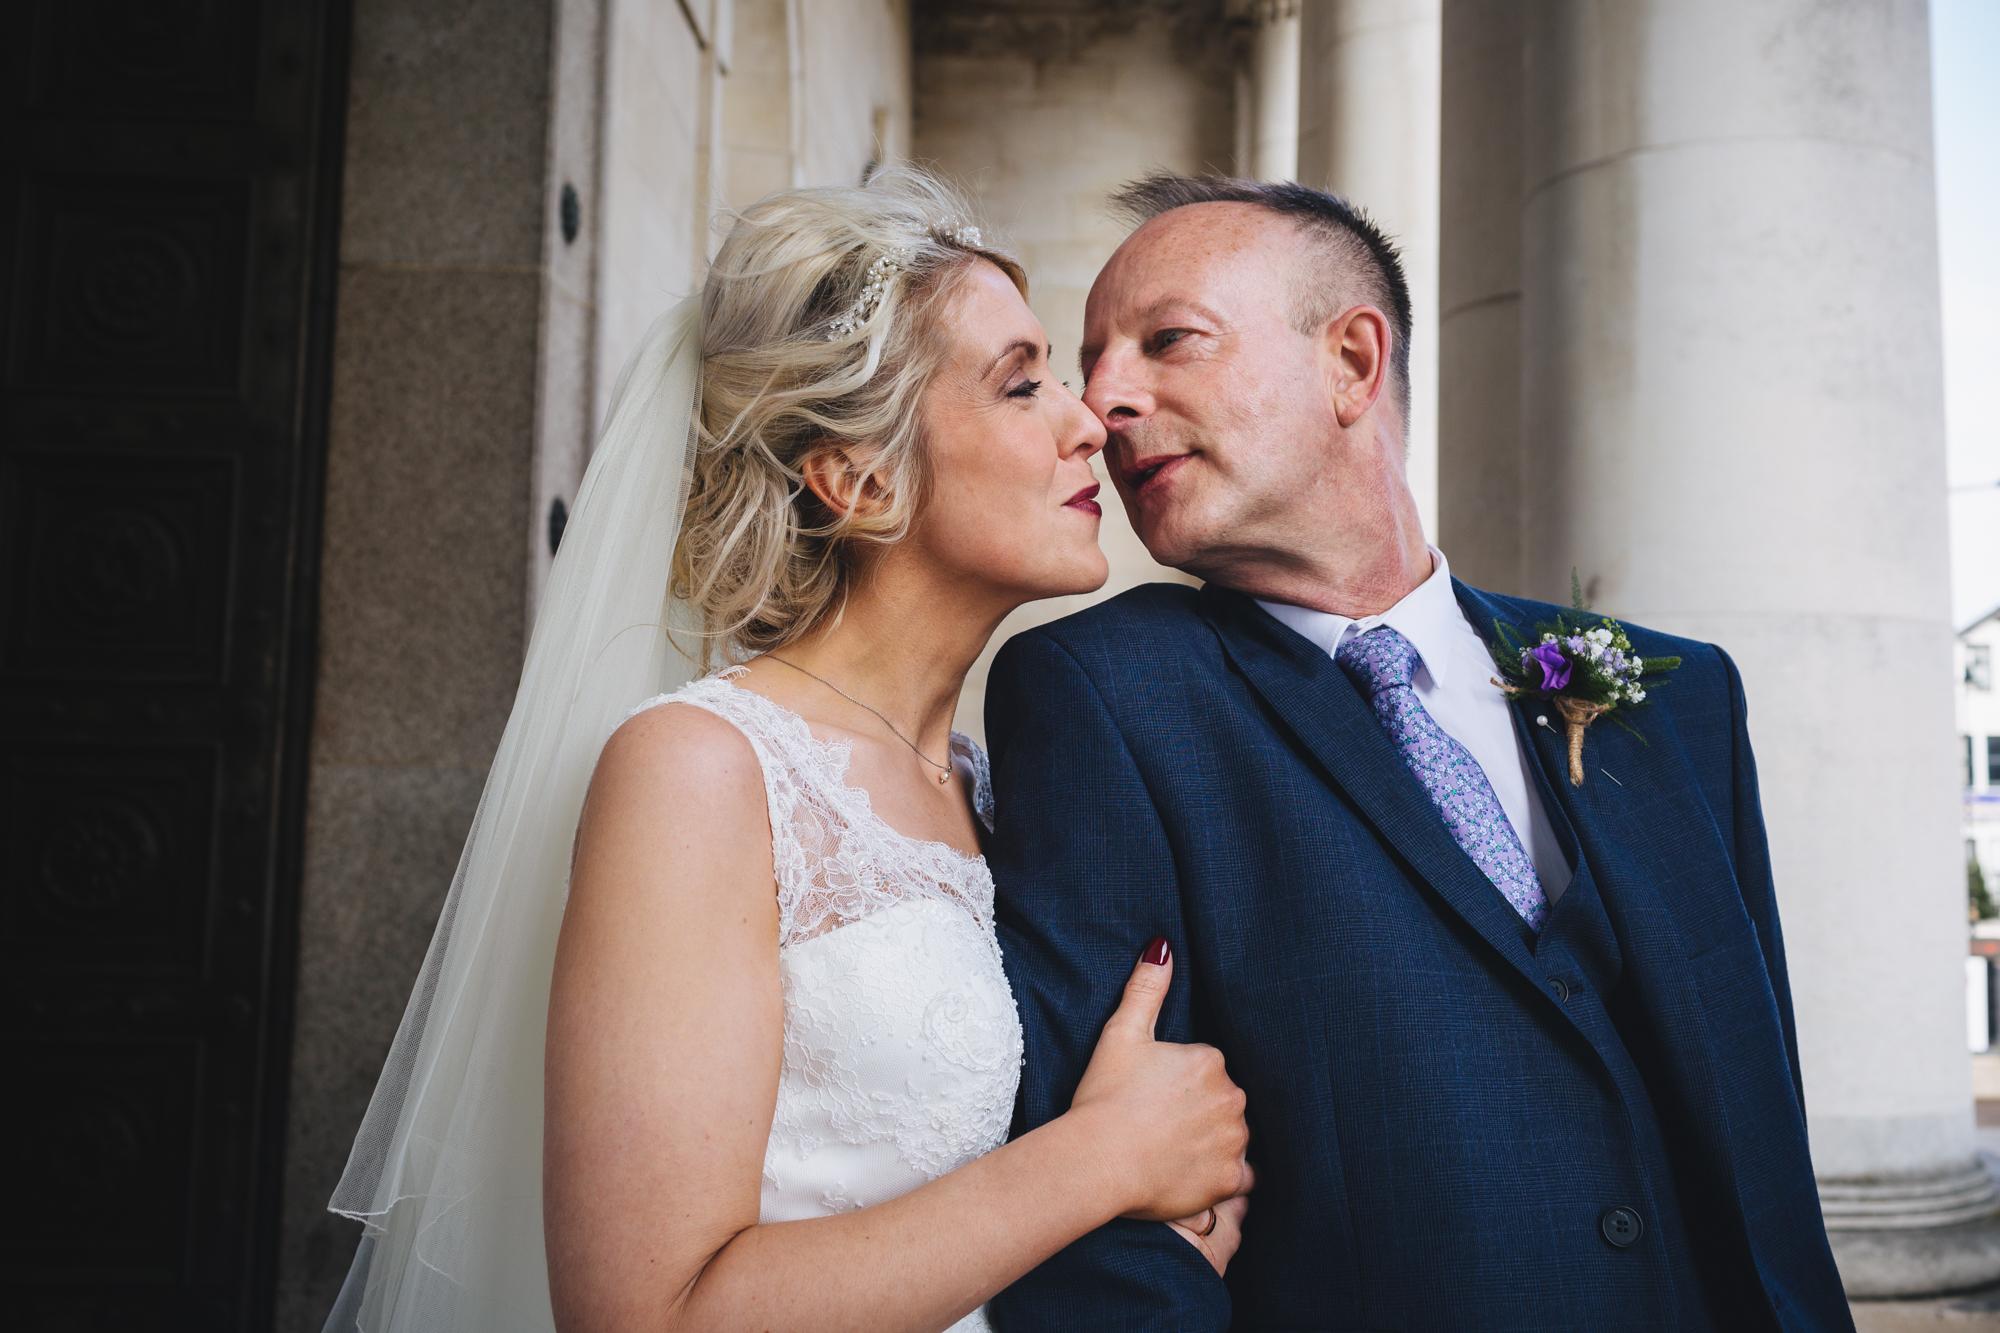 Wedding photographer Cardiff, South Wales, Park Plaza Hotel weddings, cardiff city hall wedding, cardiff museum wedding photographs